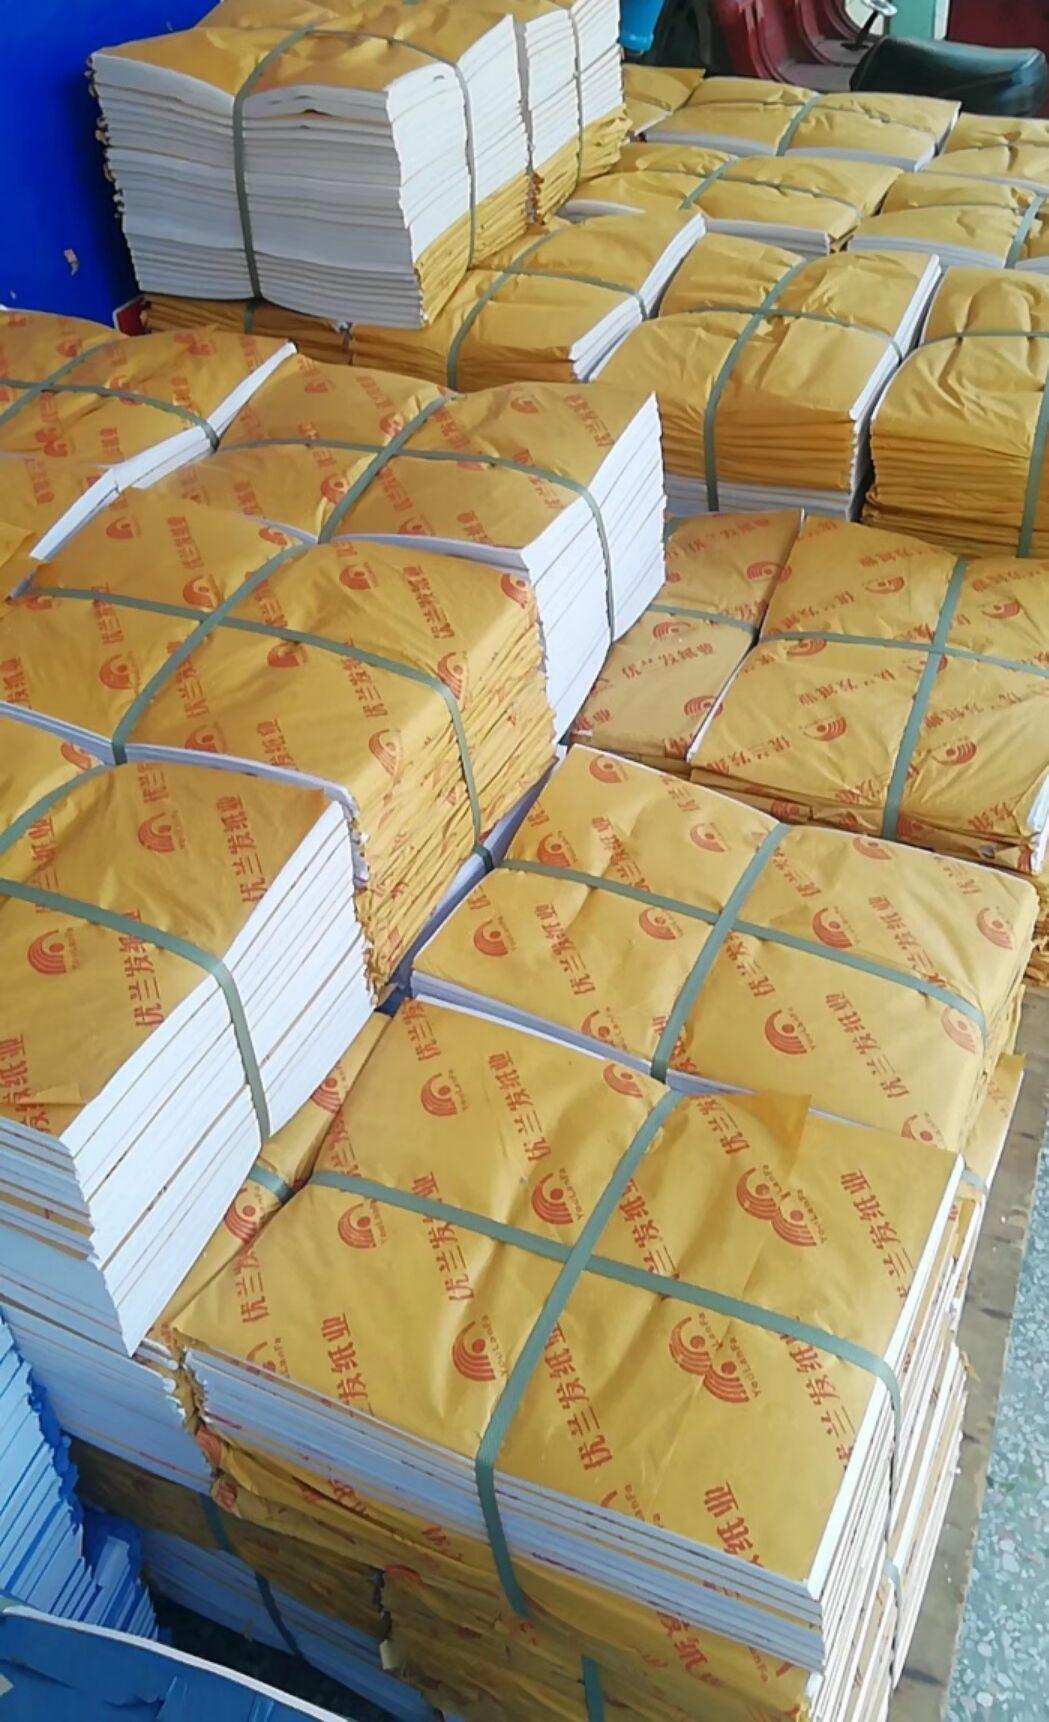 A级平板拷贝纸专业印刷logo商标防潮建宁拷贝纸